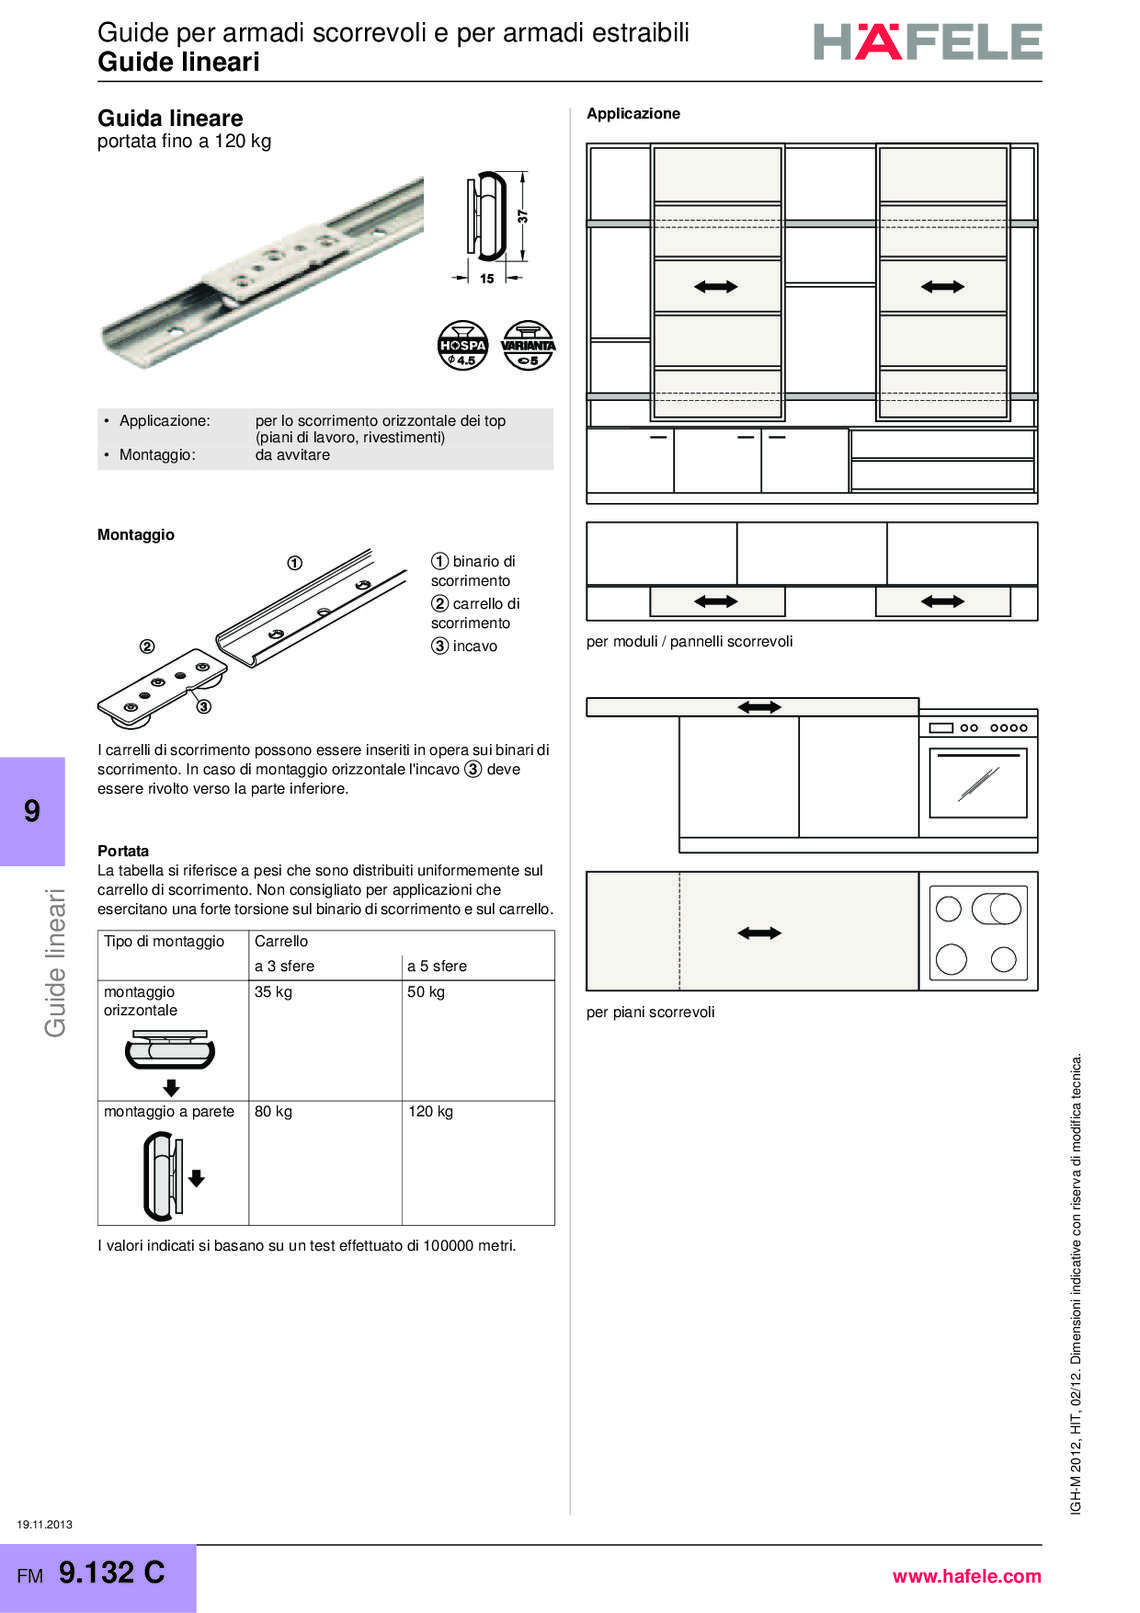 hafele-spondine-e-guide-per-mobili_40_187.jpg